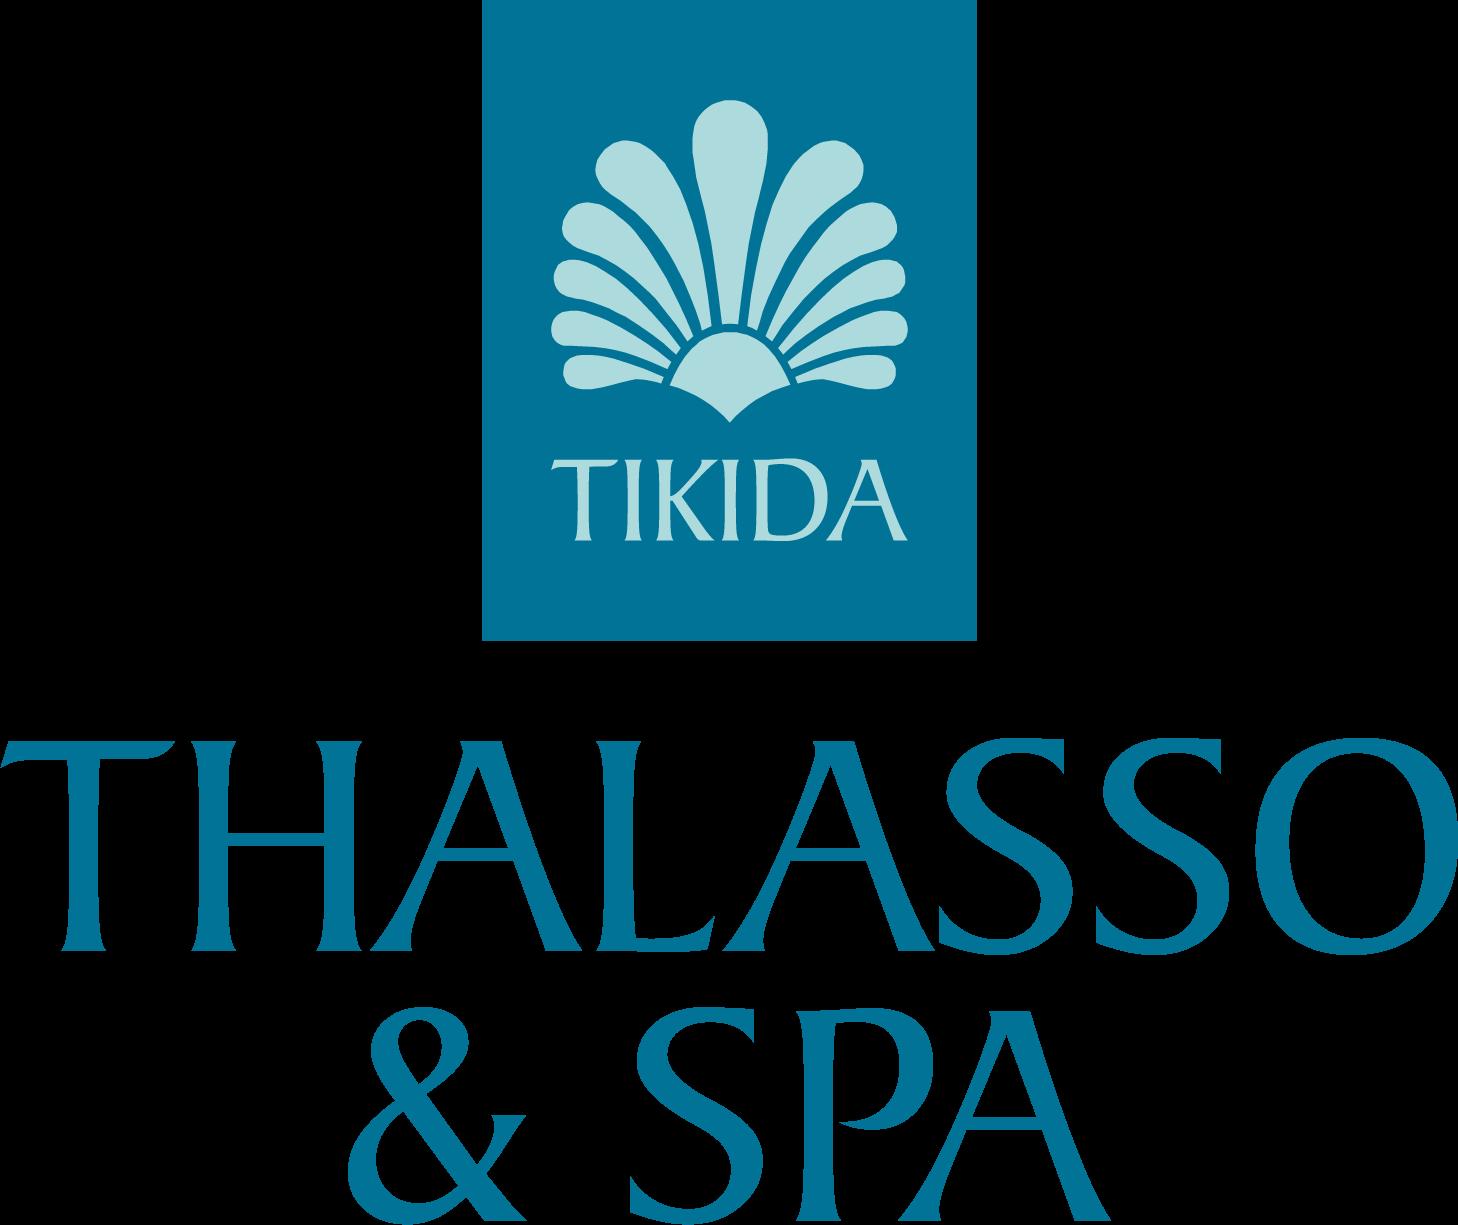 Tikida Thalasso & Spa